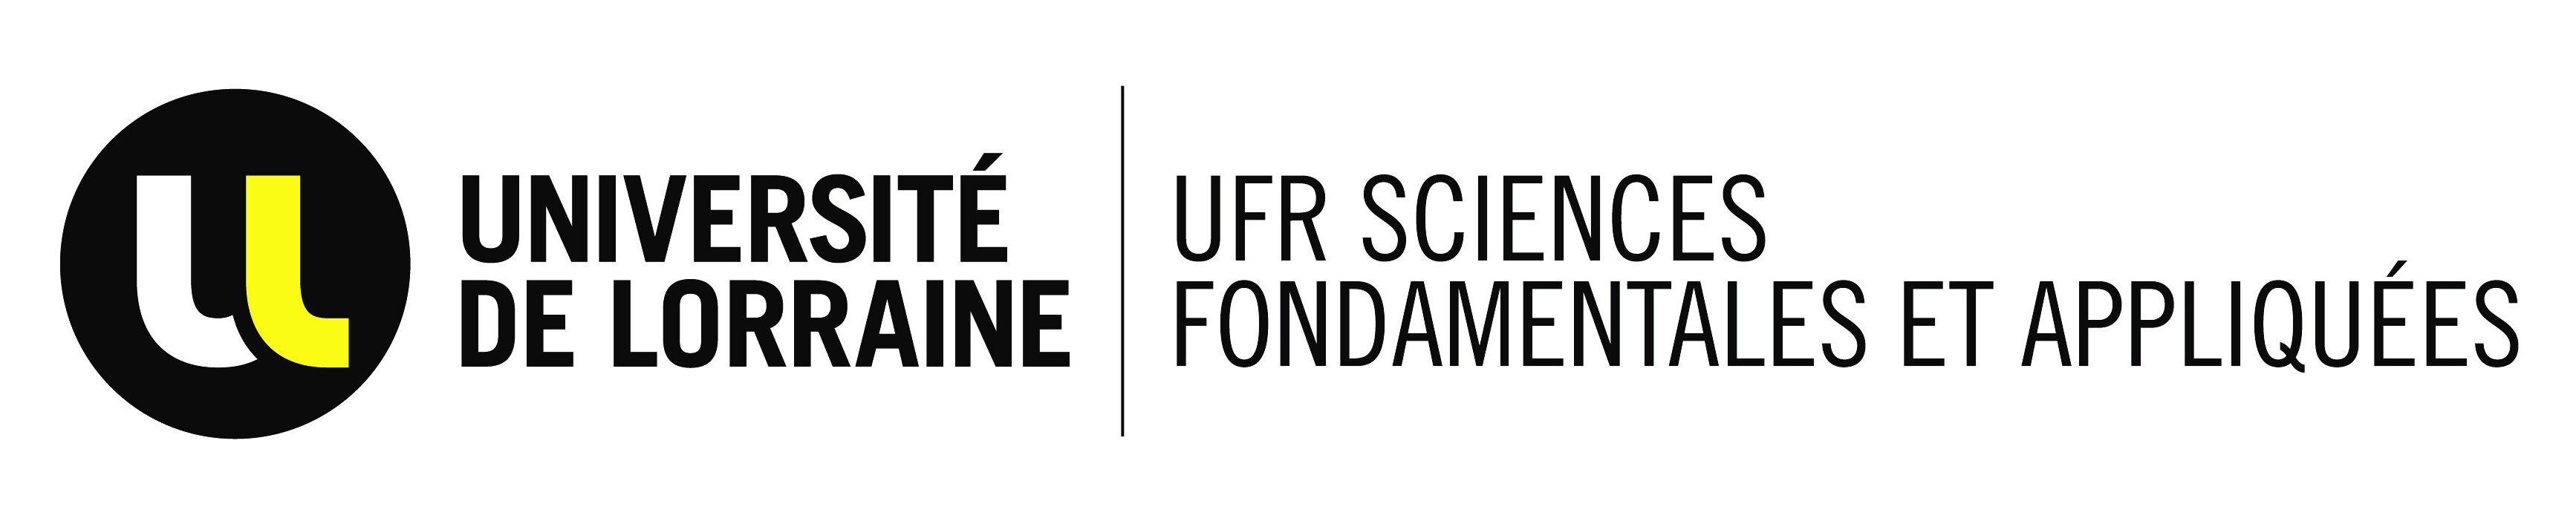 UFR SCIENCES FONDAMENTALES.png